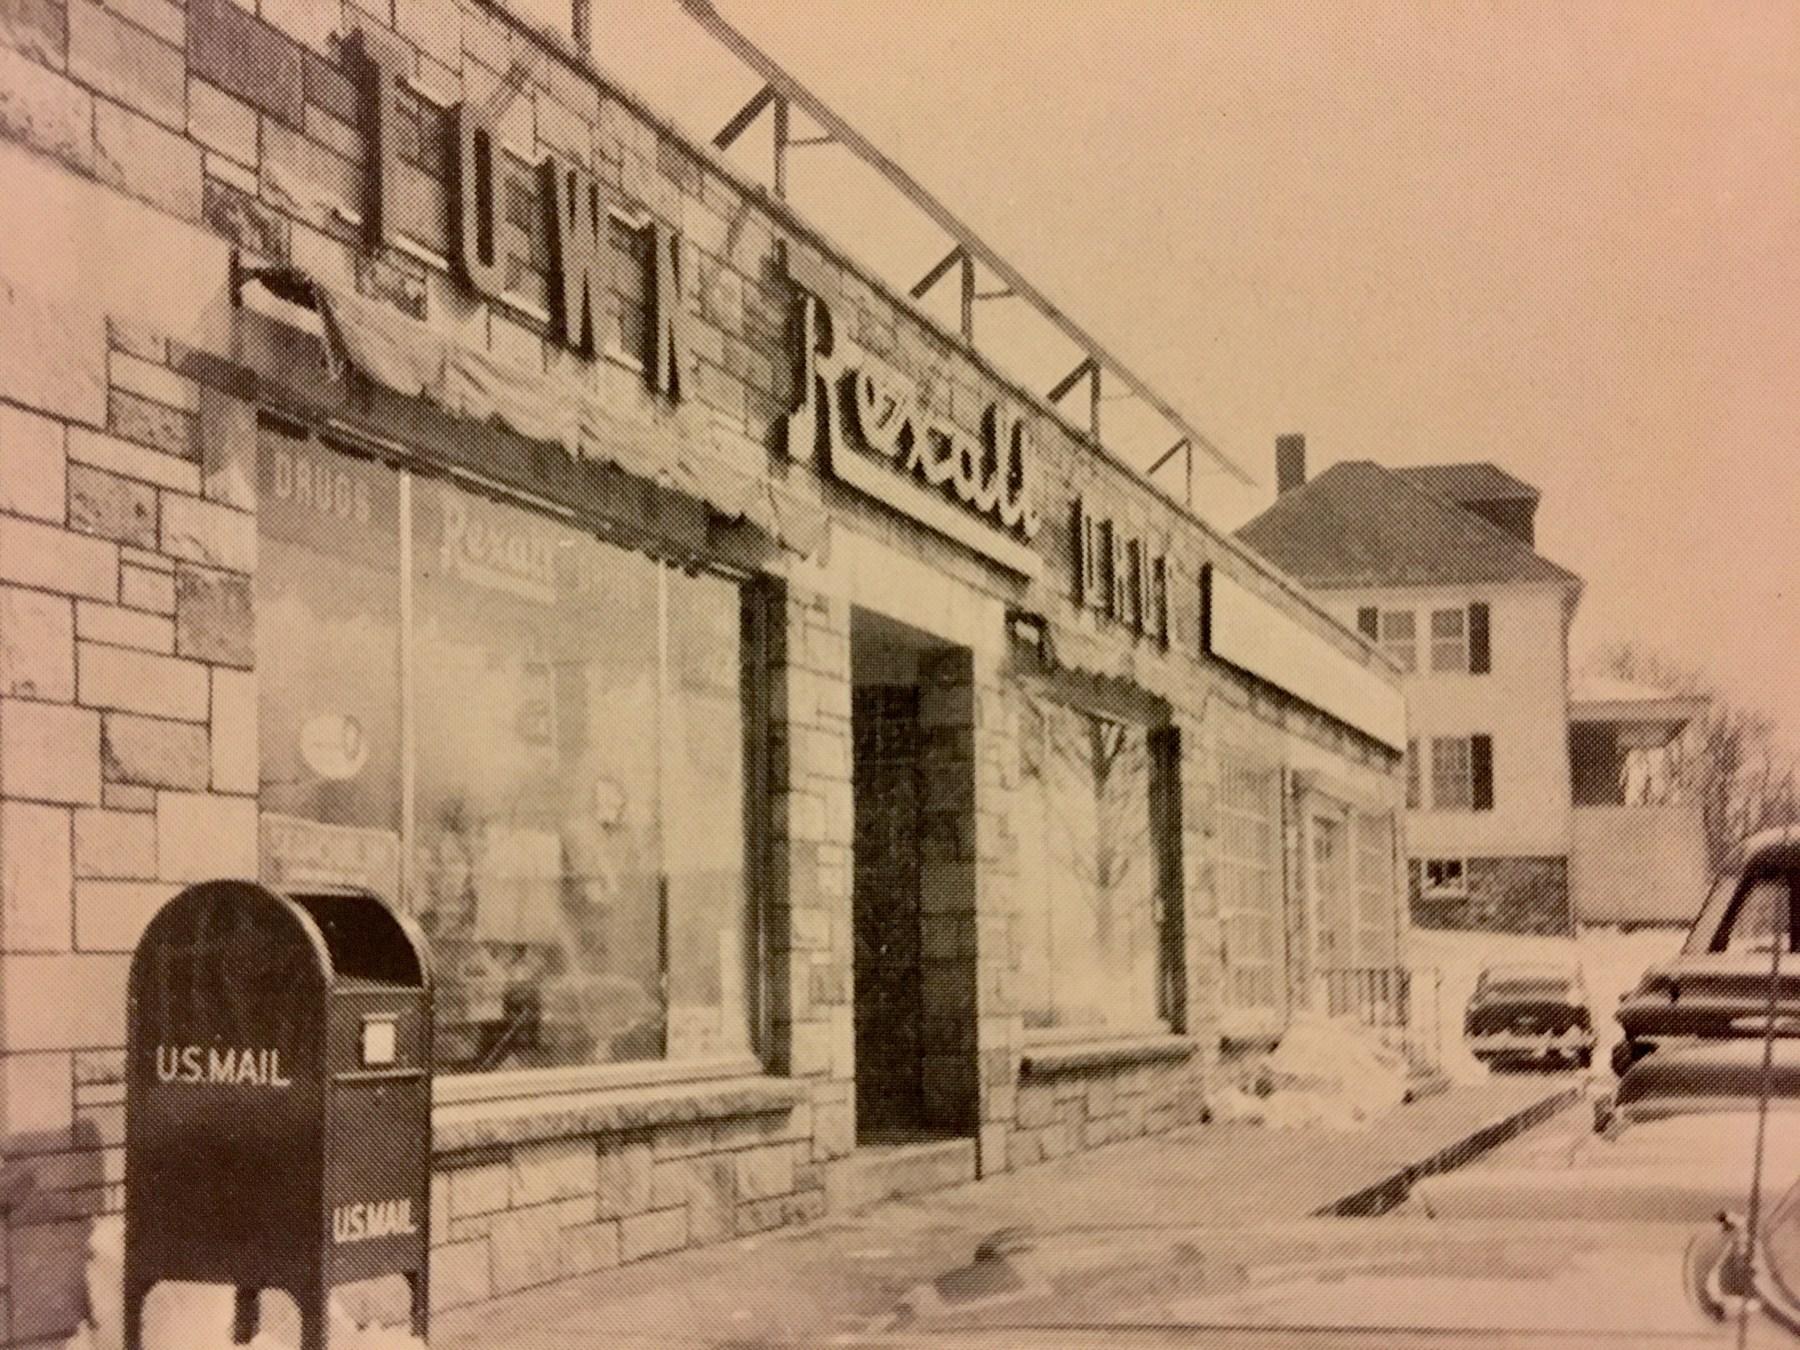 Rexall Drug, Burlington MA, late 1950s